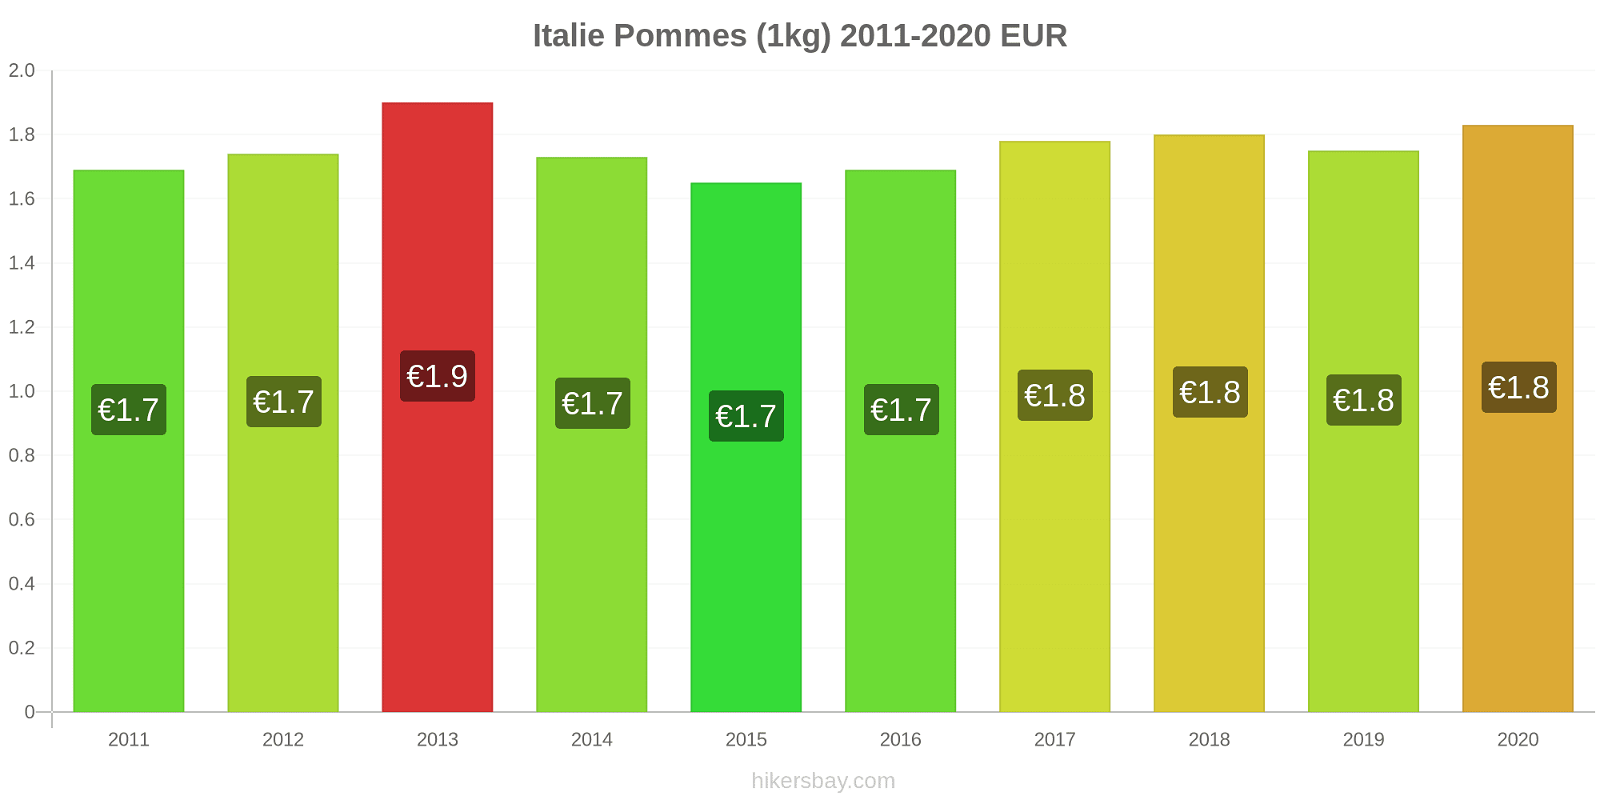 Italie changements de prix Pommes (1kg) hikersbay.com